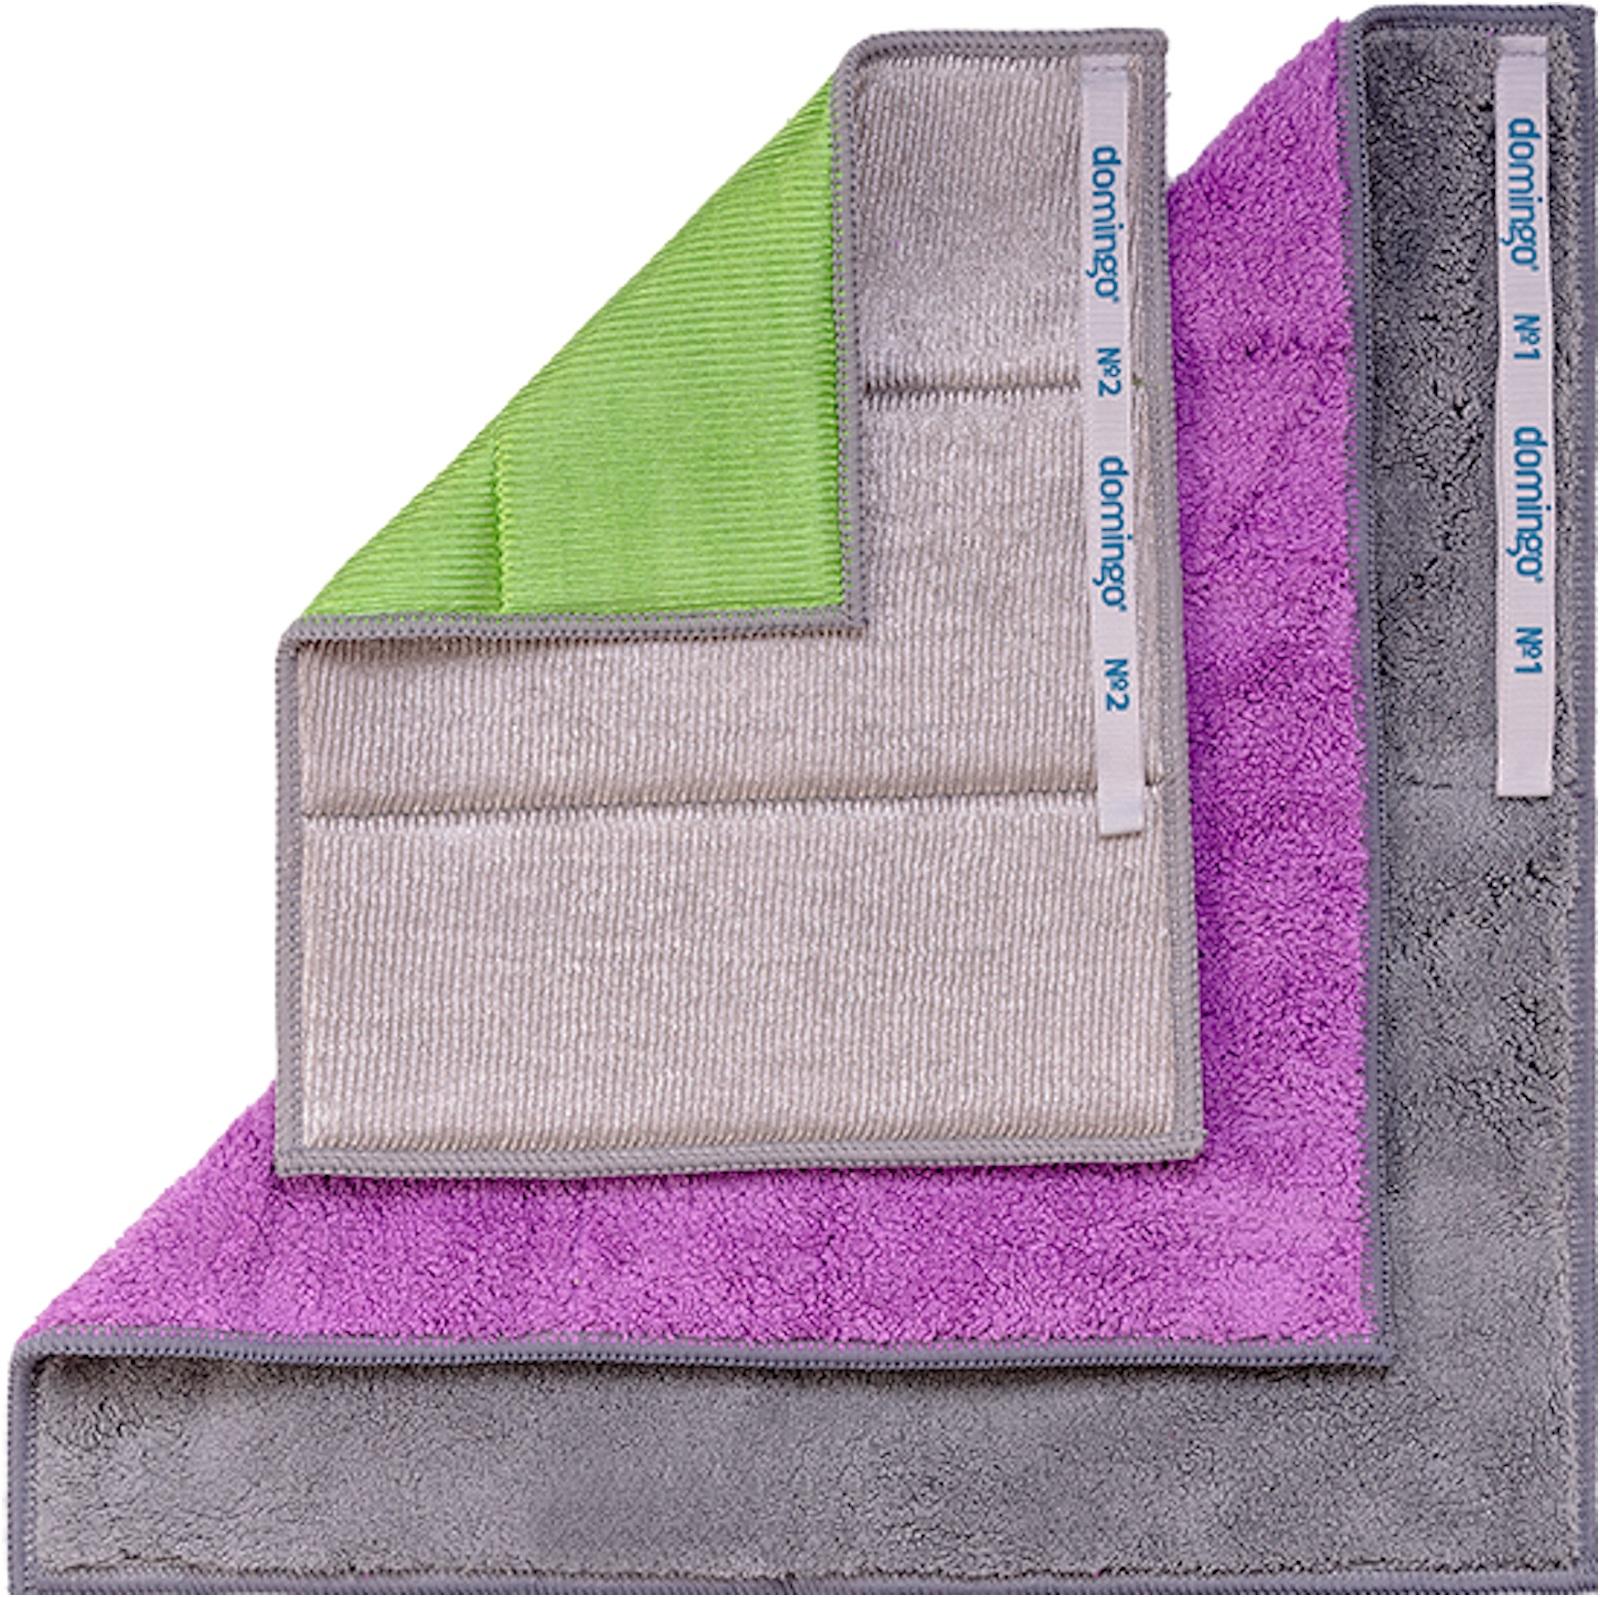 Миниатюра Салфетка для уборки Domingo Виндозер для мытья окон 20x25, 30x35 см 2 шт №2